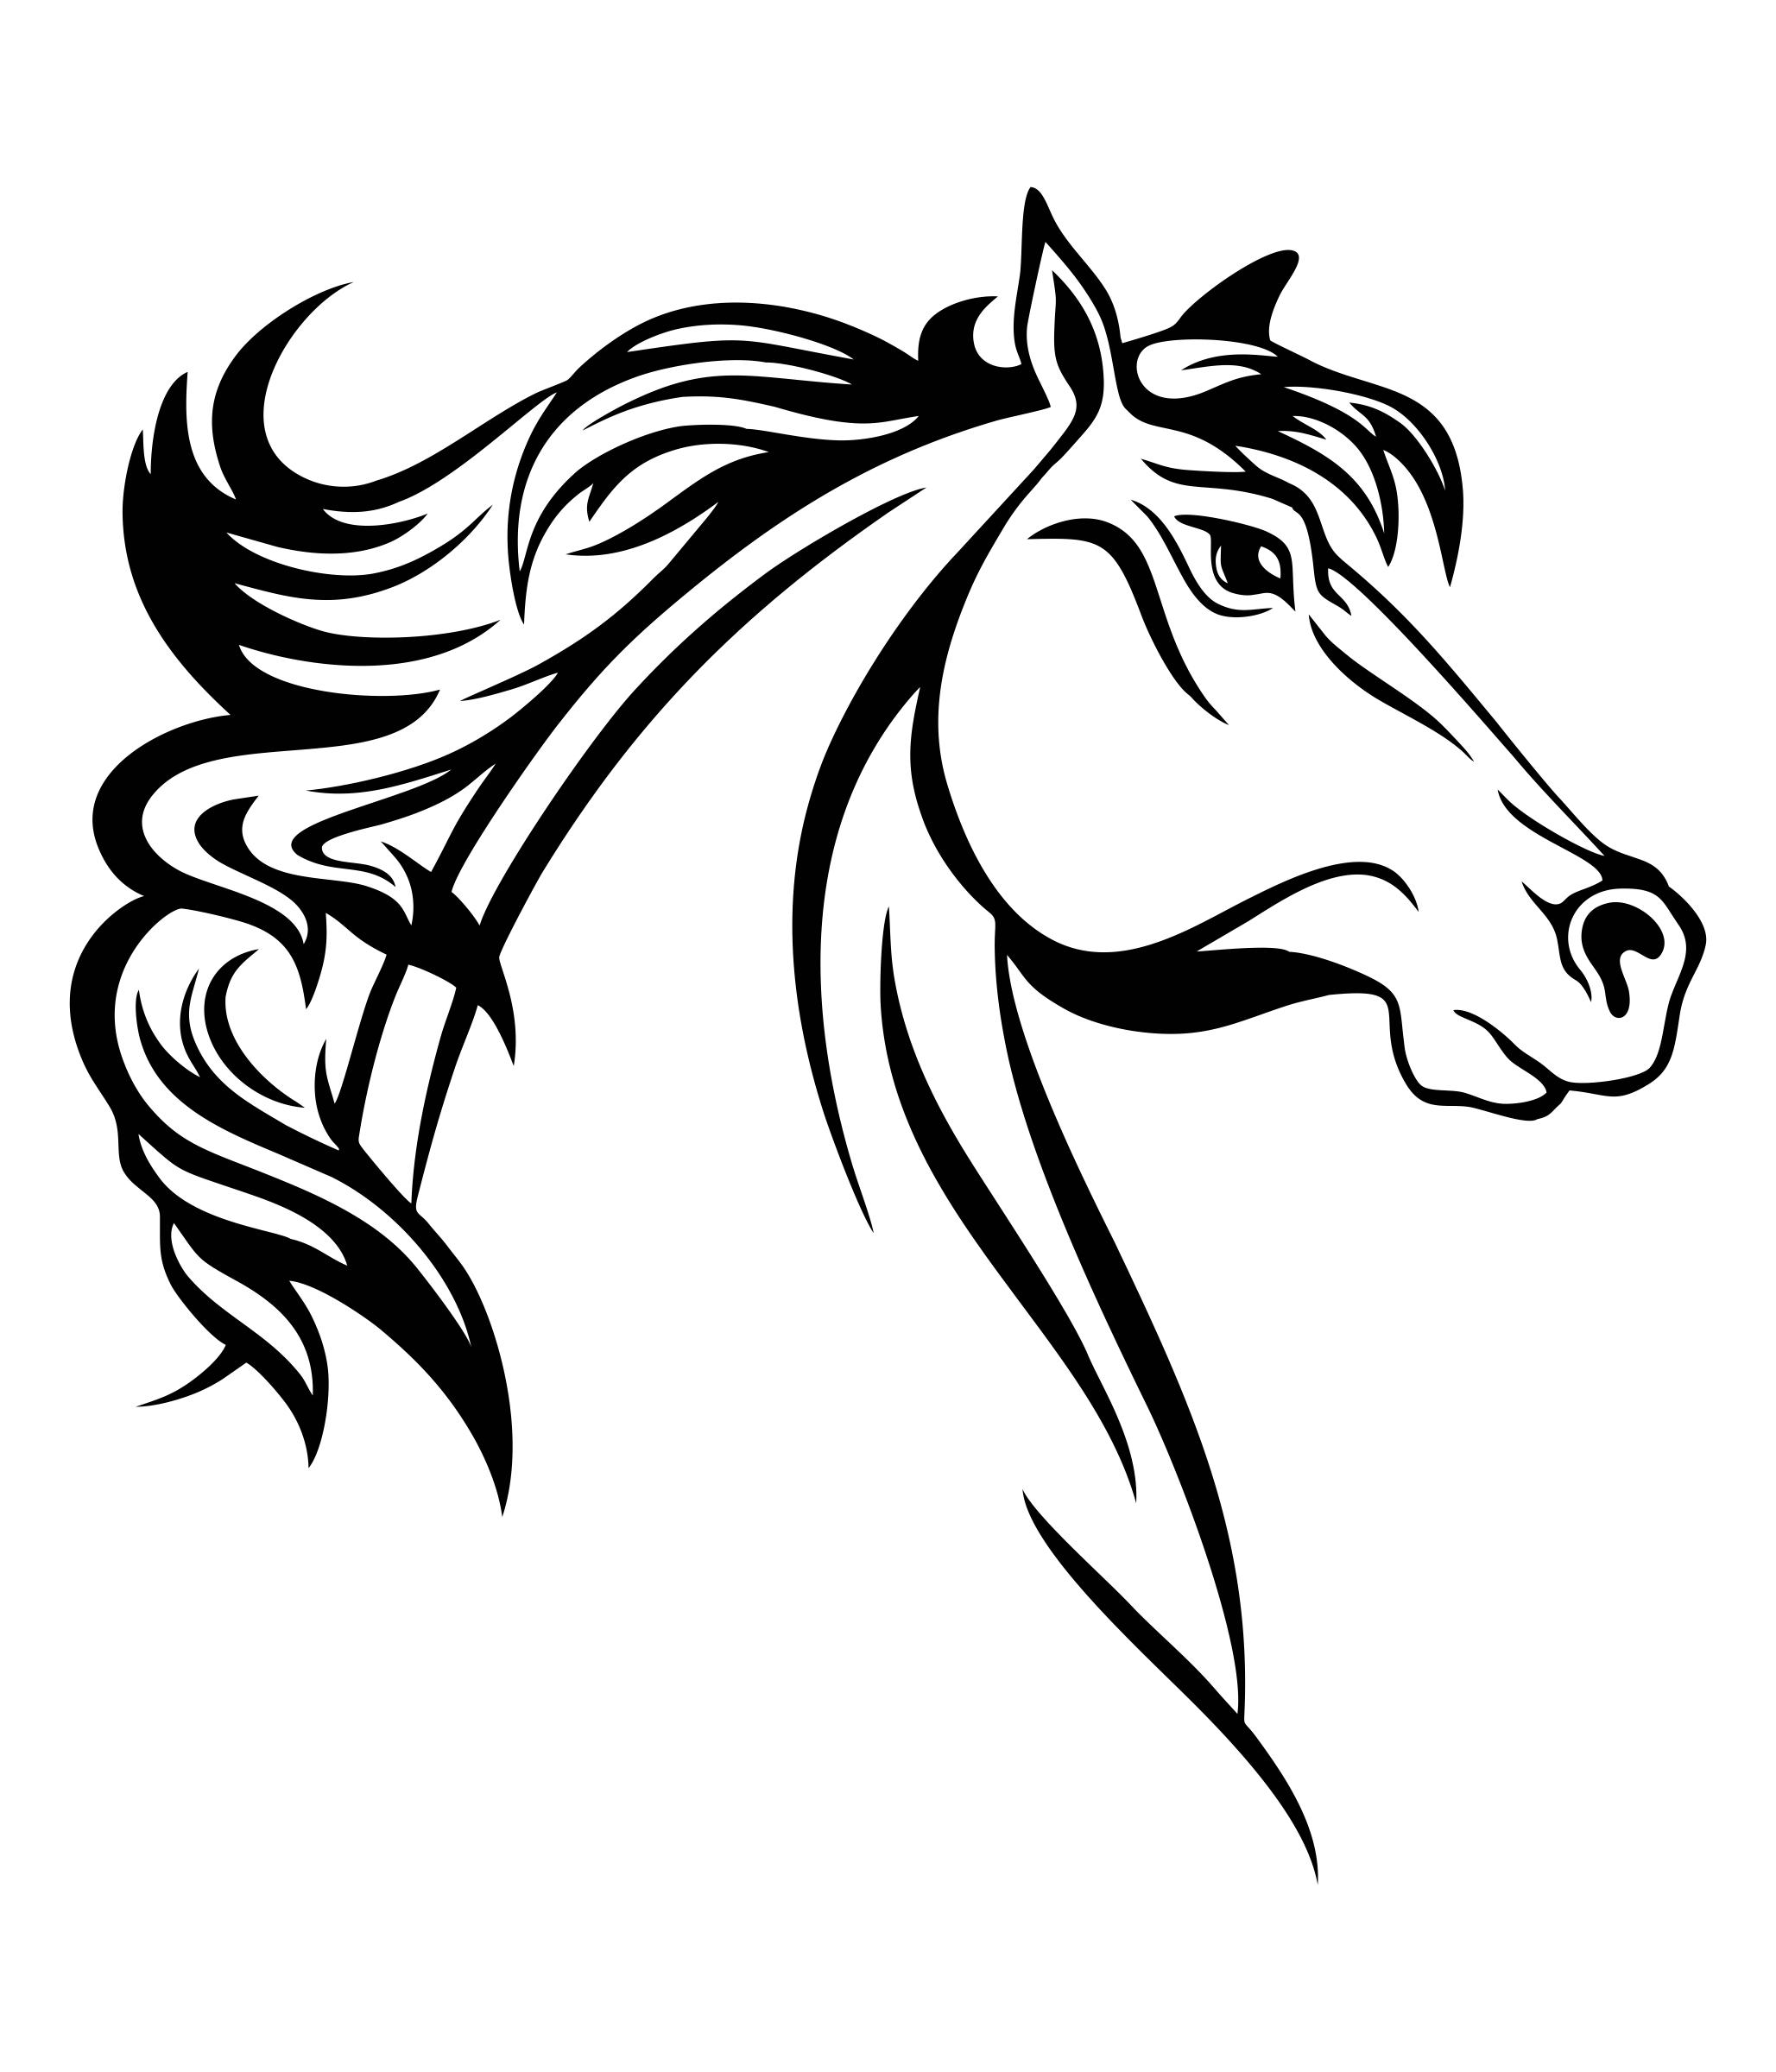 Horse 2011